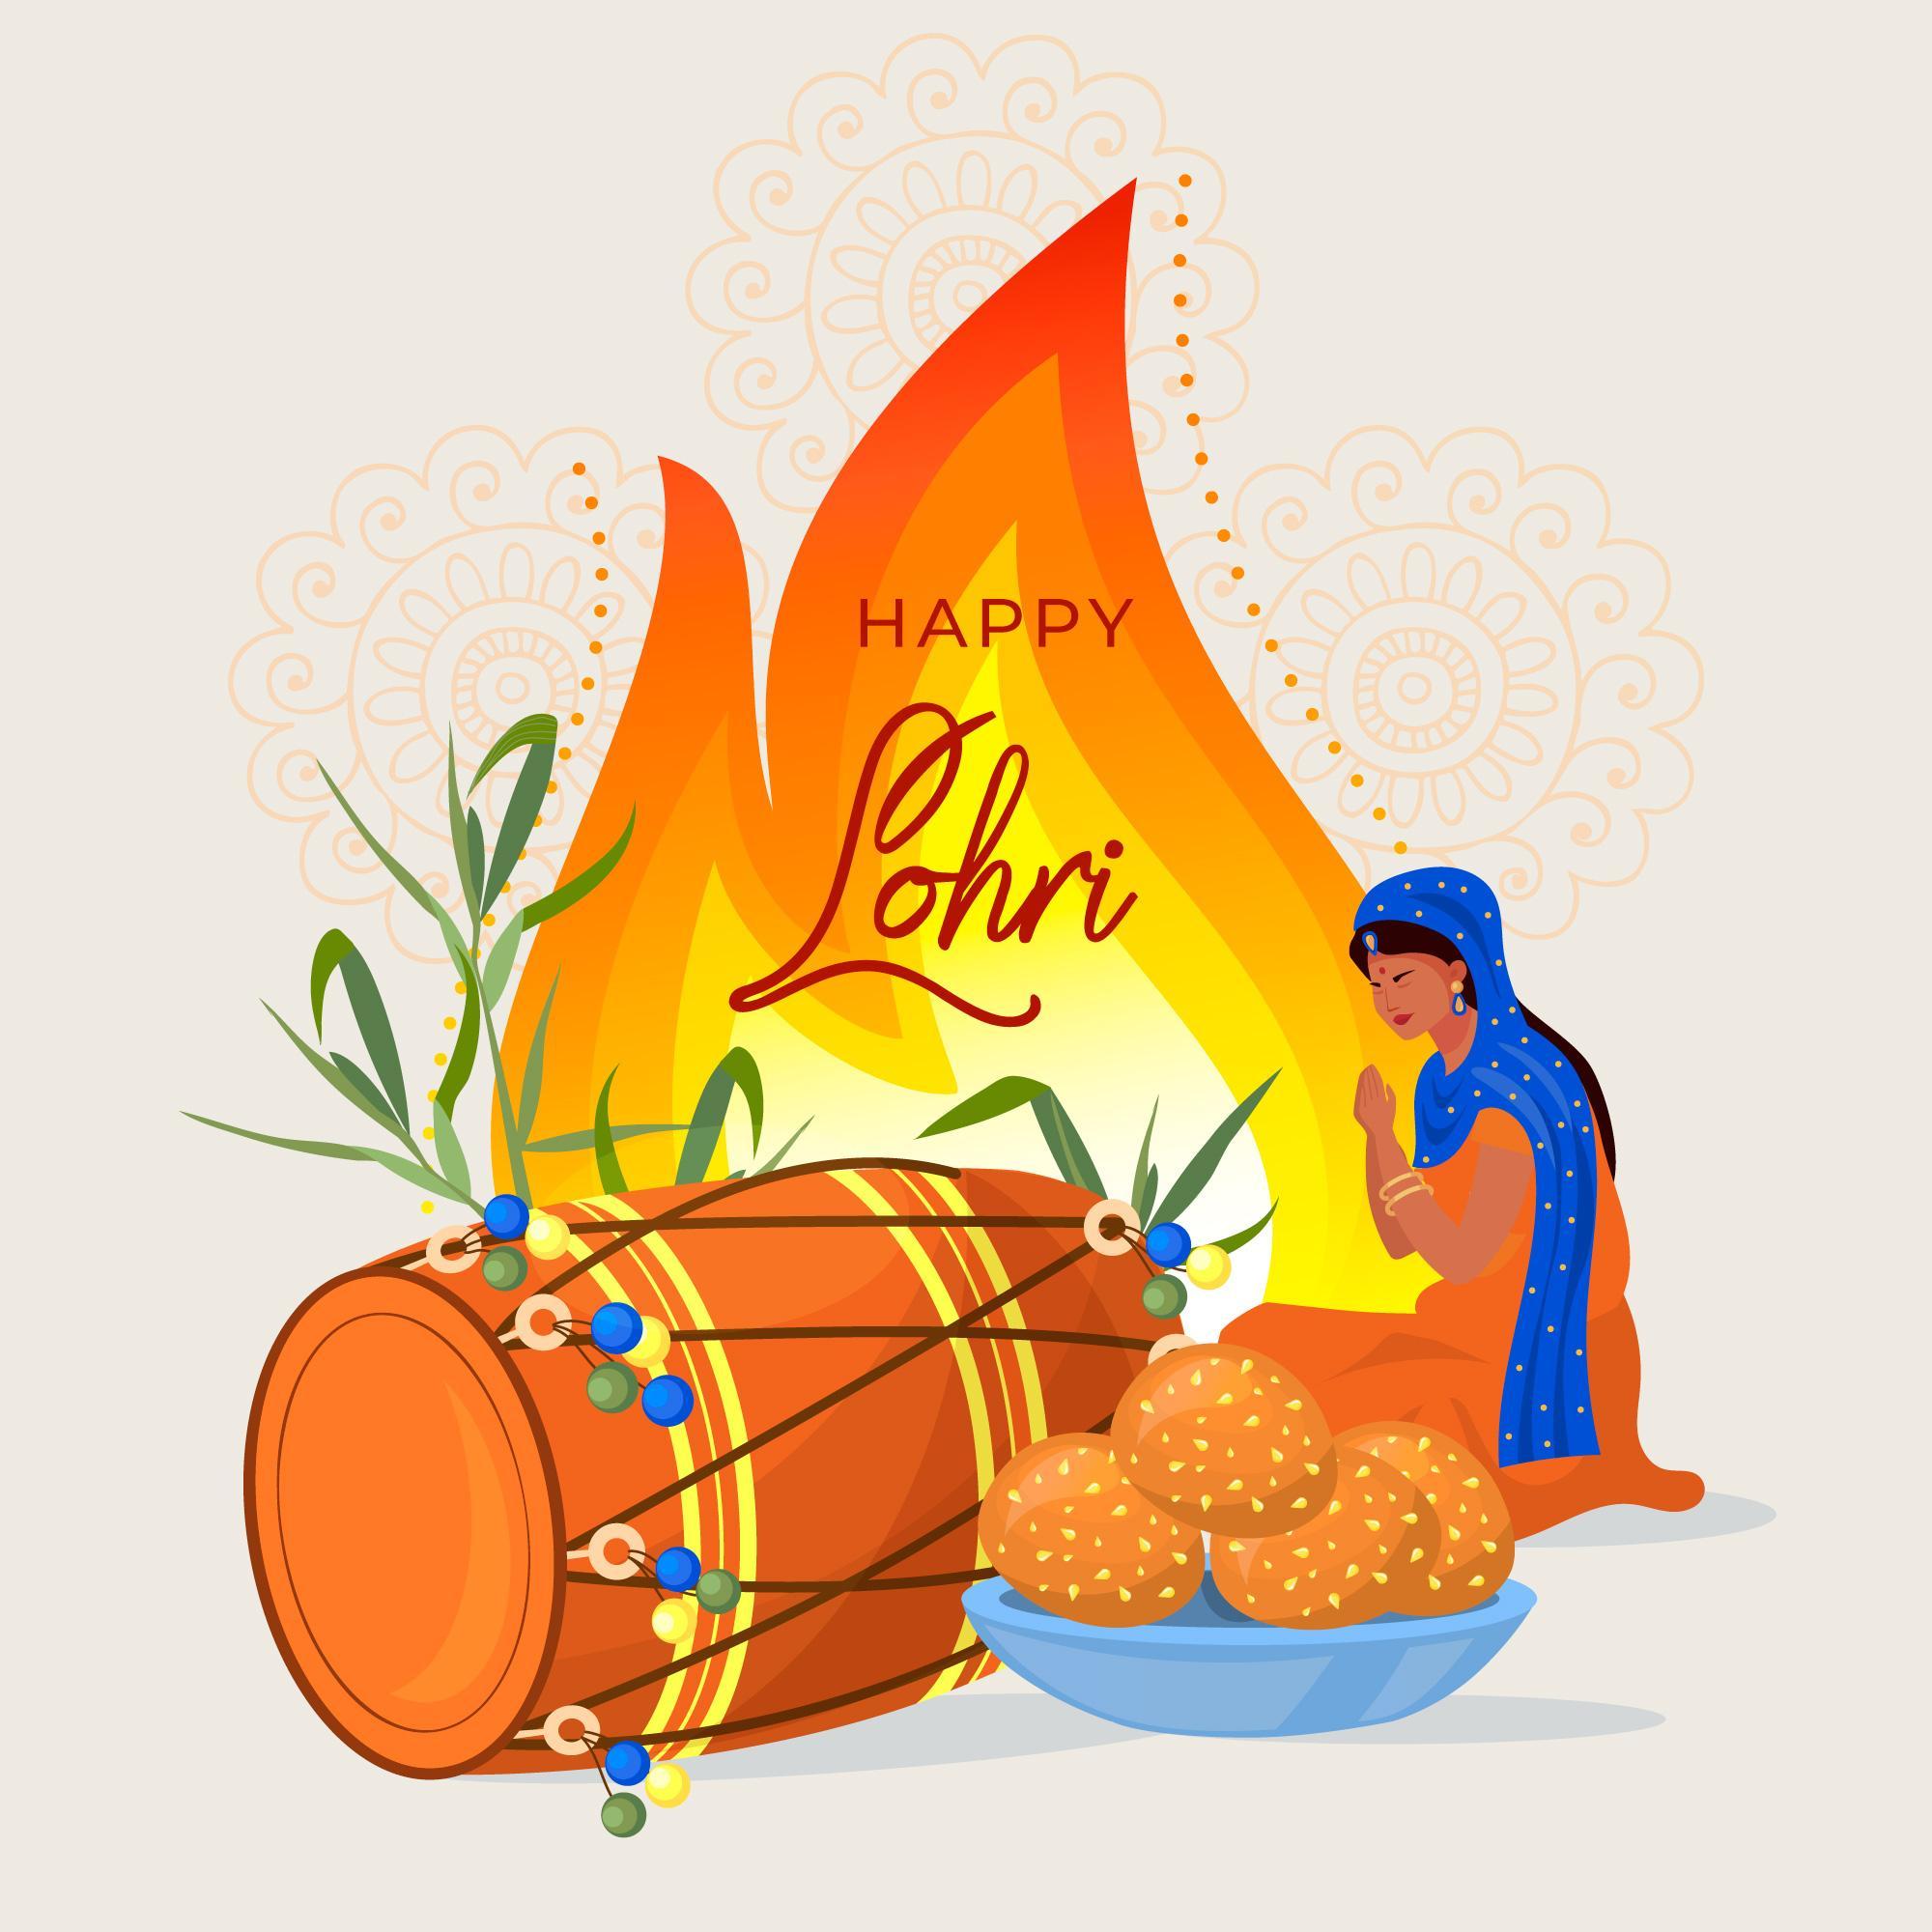 Happy Lohri Celebration Background With Panjabi Women